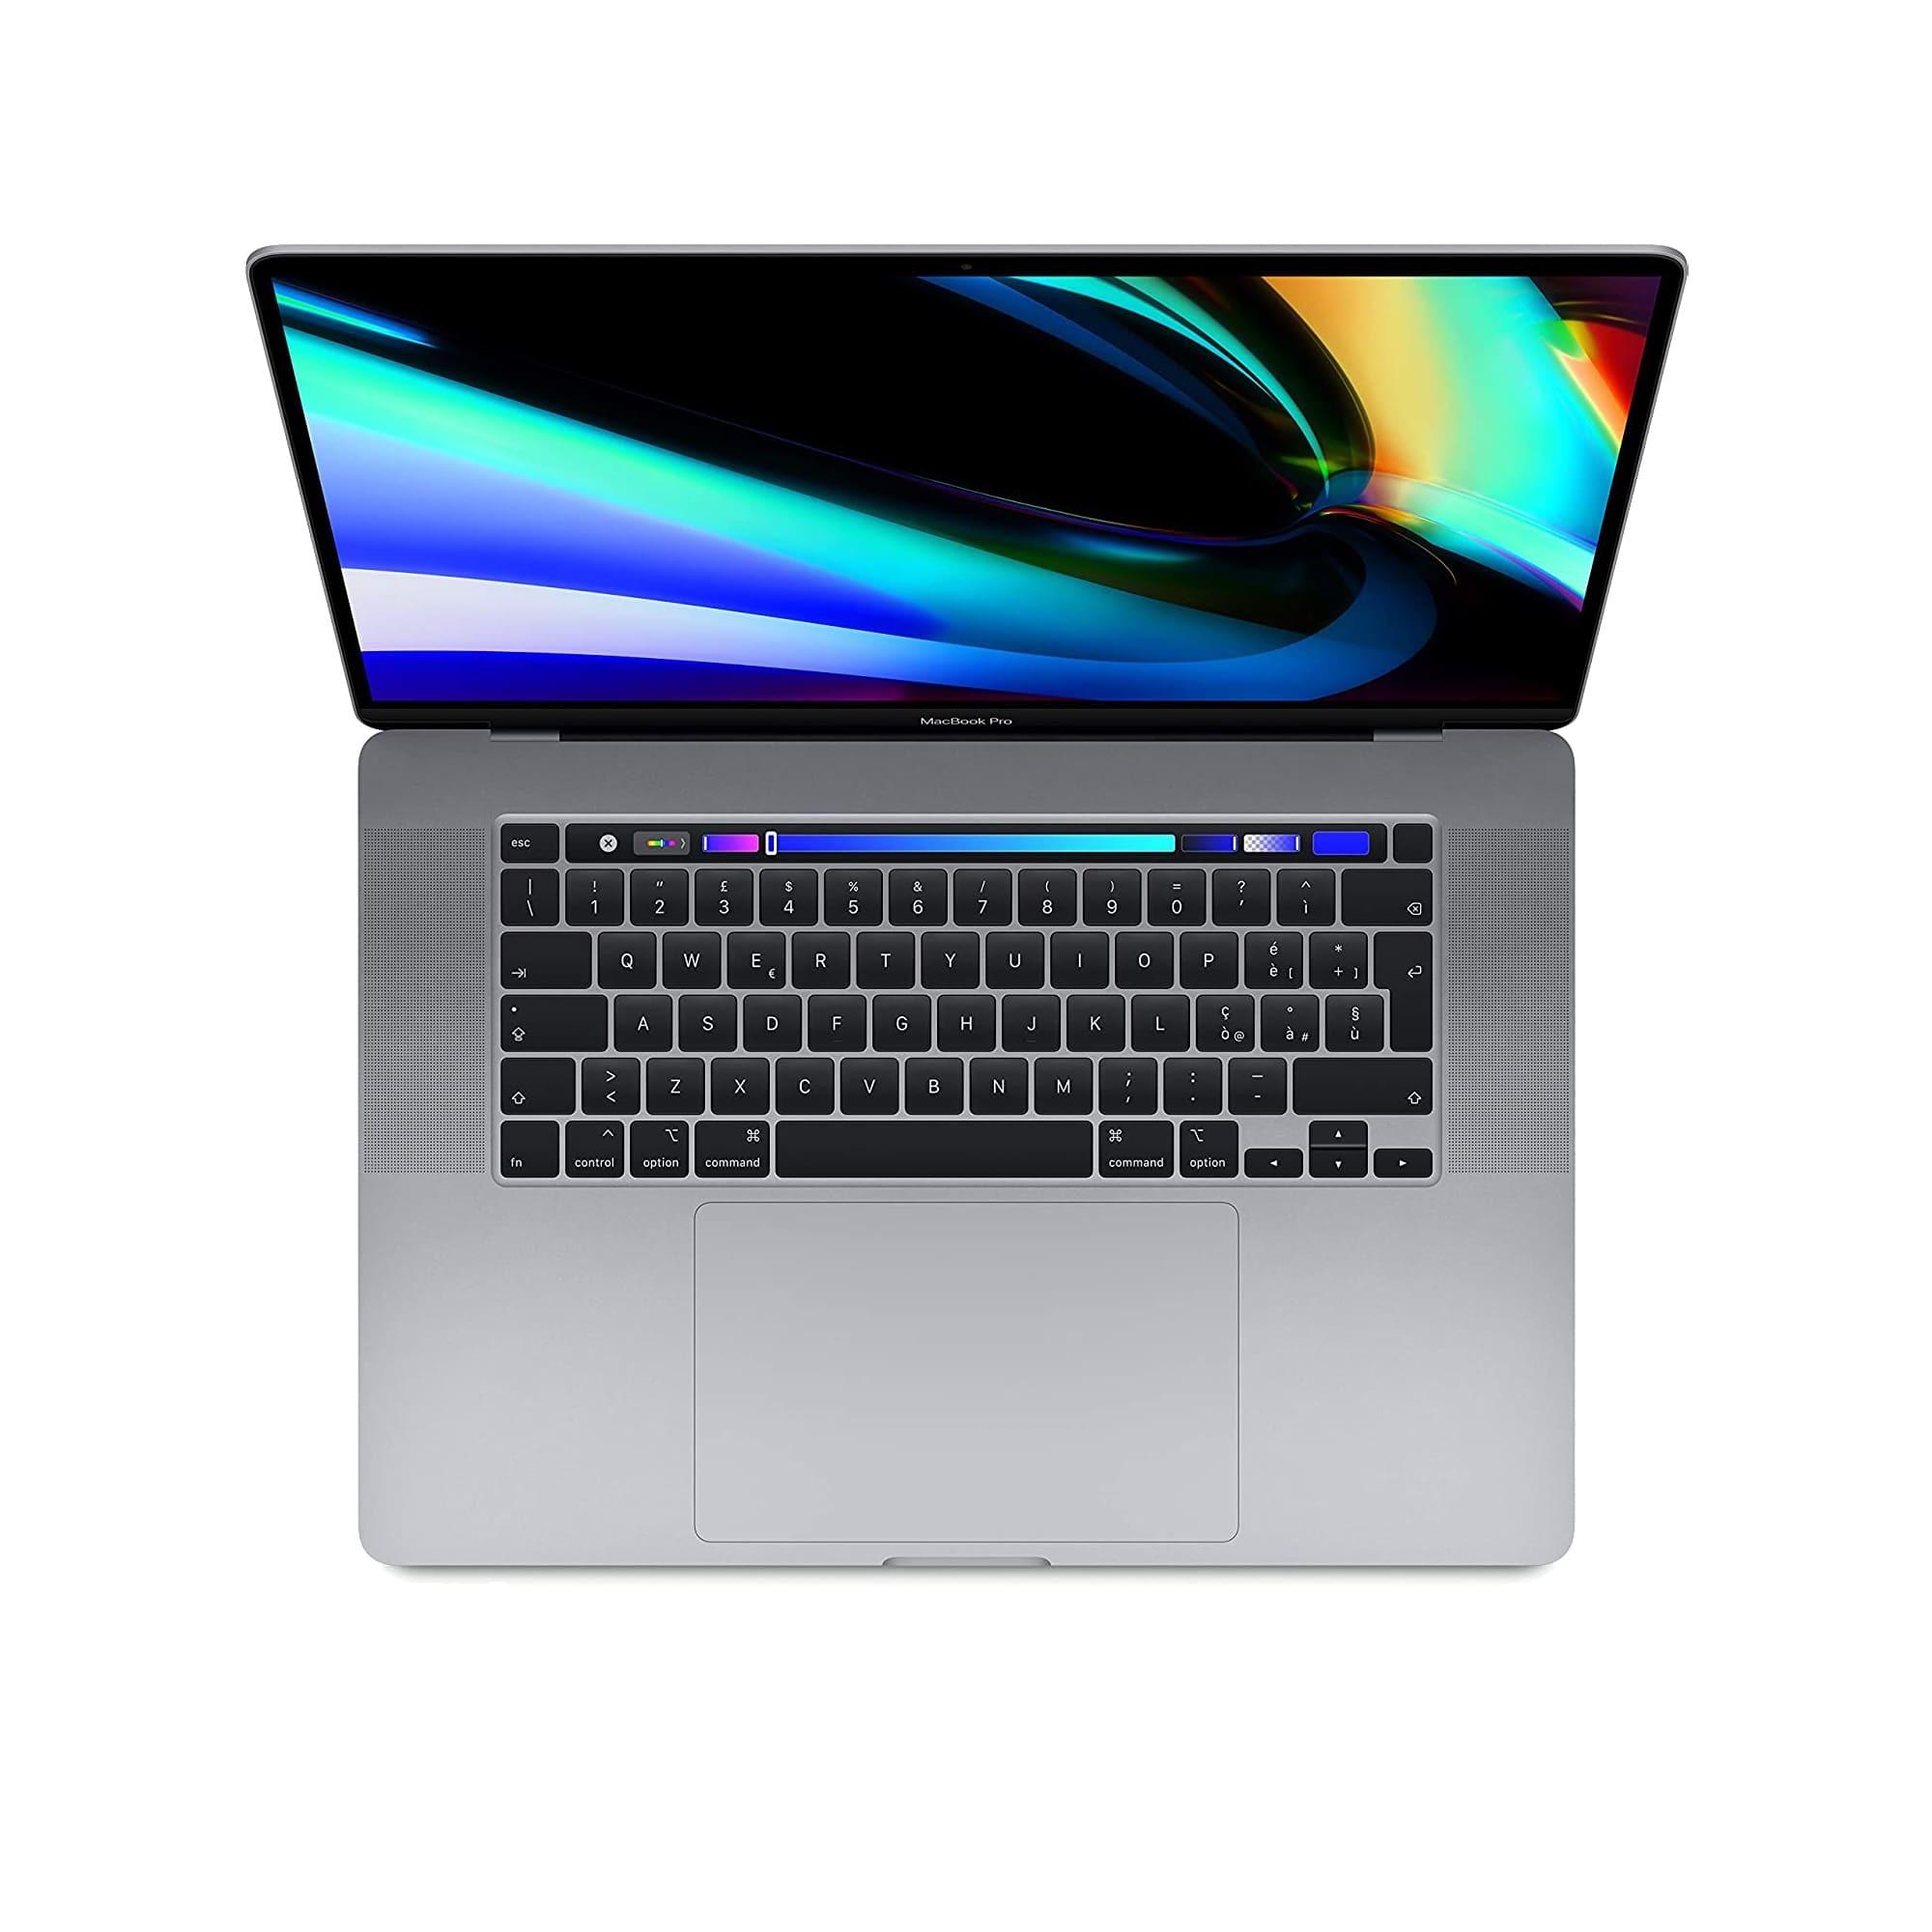 Vendere-Valutare-MacBook Pro Retina 16 pollici